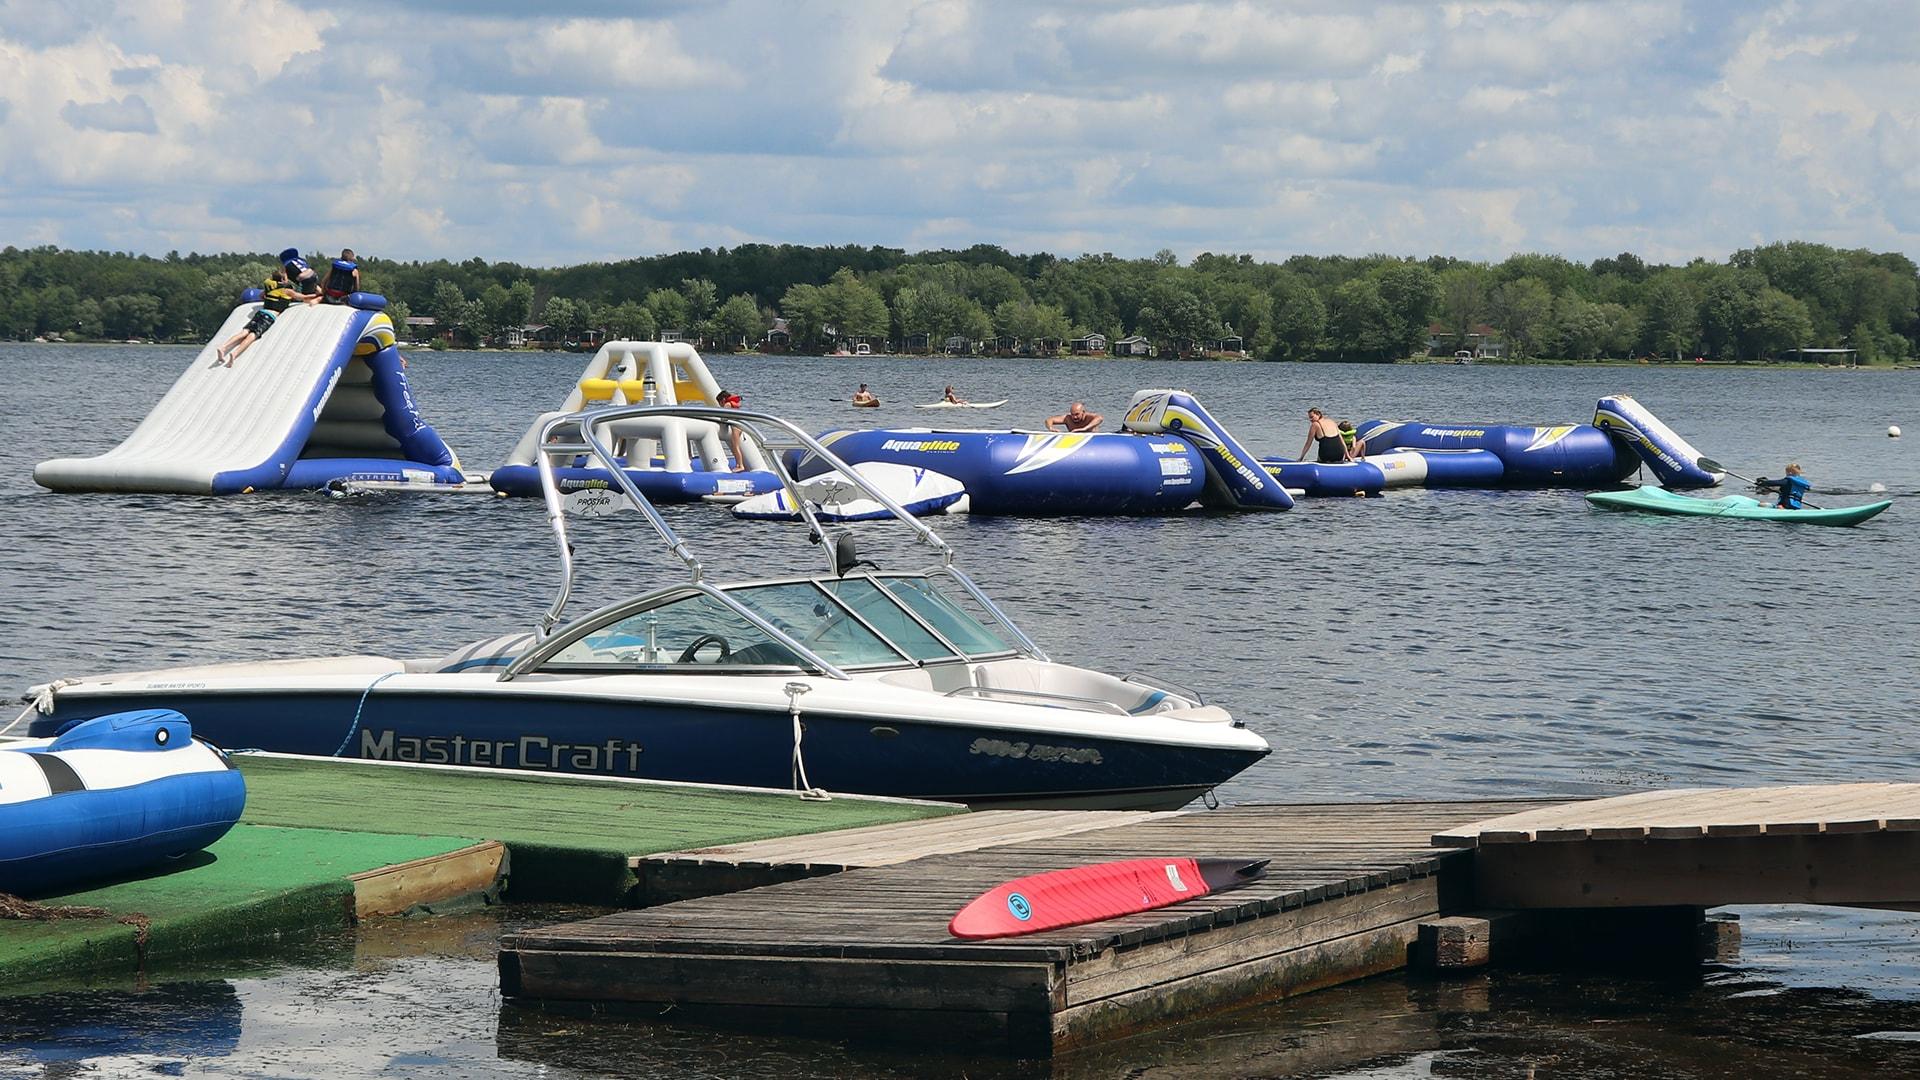 Bayview Waterpark min - Adventure Day 2.0